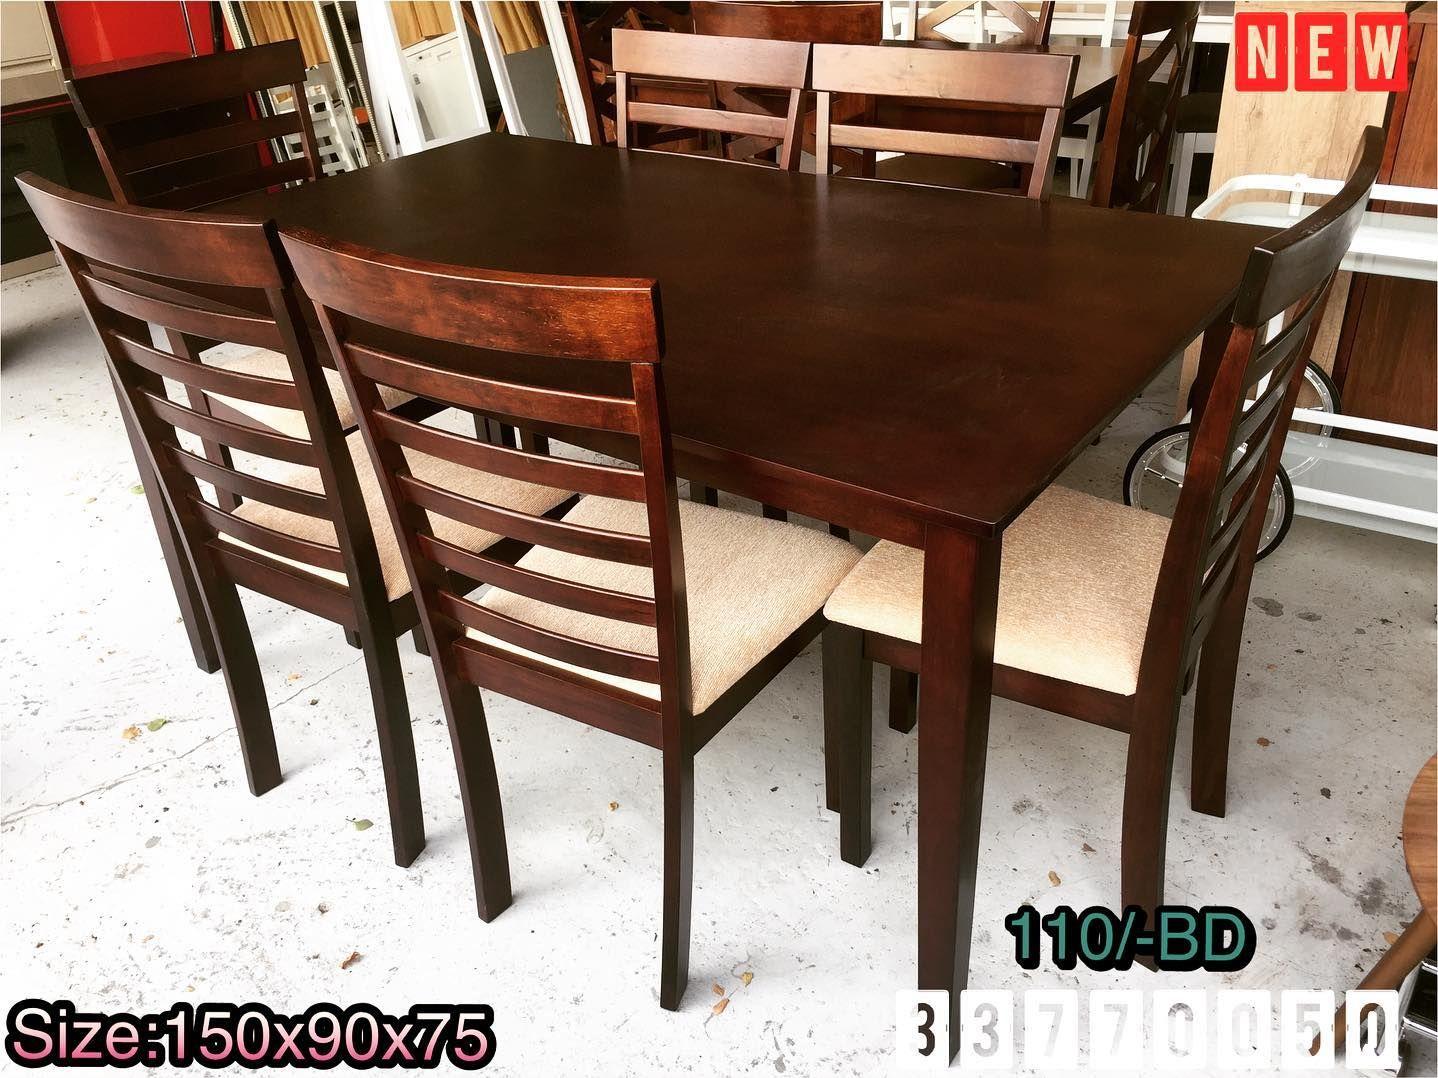 Pin By علي الصالحي On طاولات الطعام Home Decor Dining Chairs Furniture